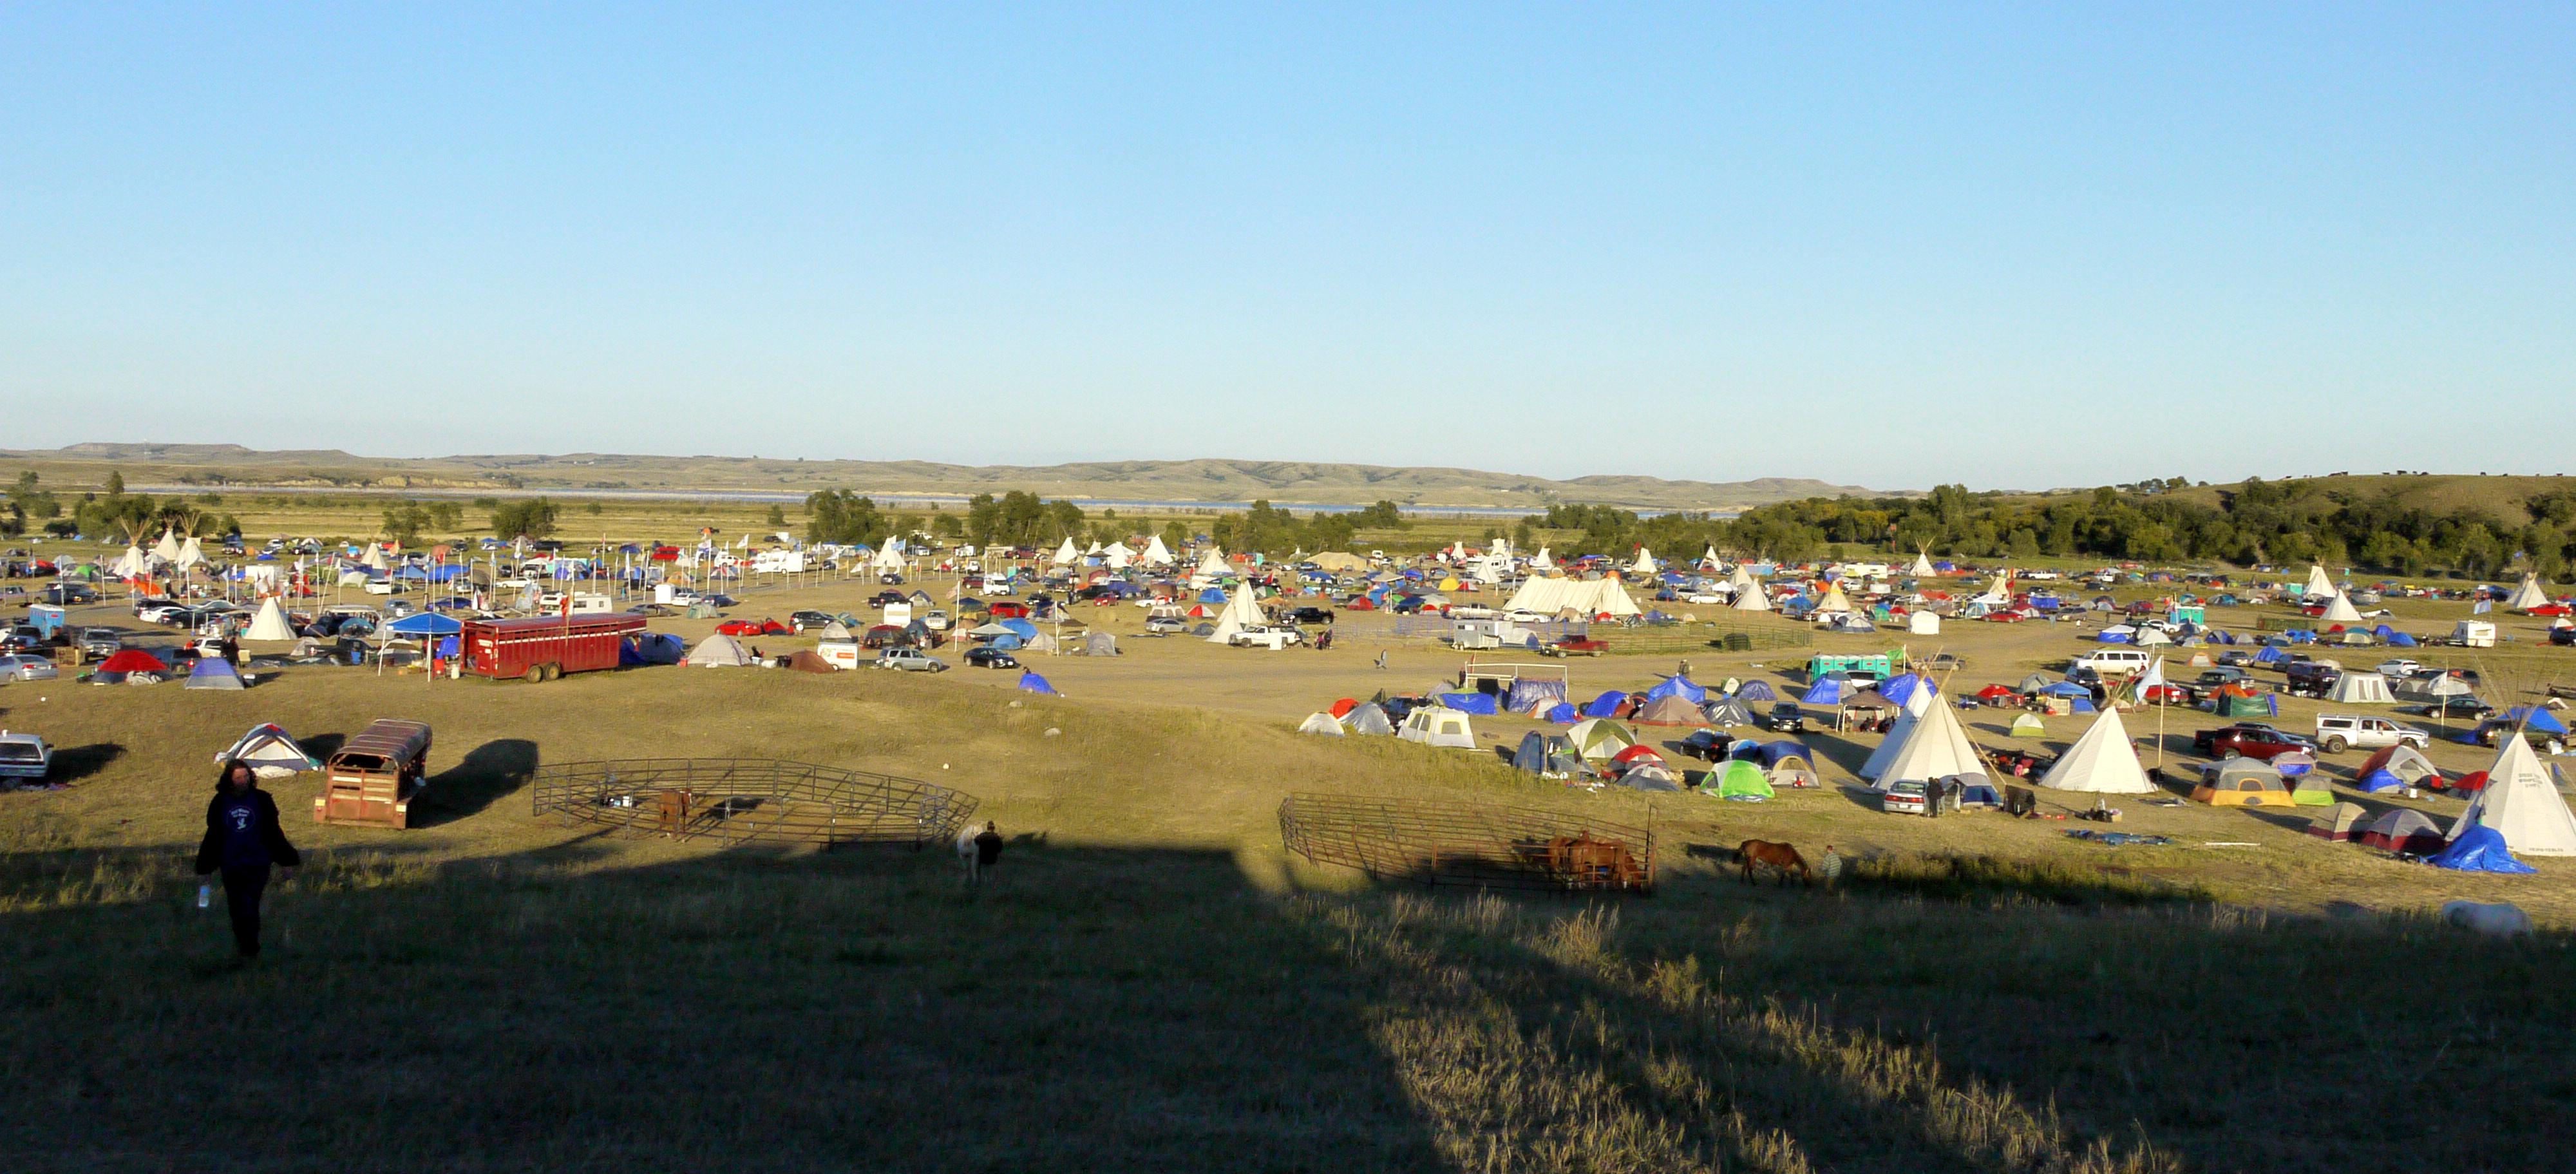 Oceti Sakowin camp, Sept. 14, 2016. (Sarah Jaffe for BillMoyers.com)